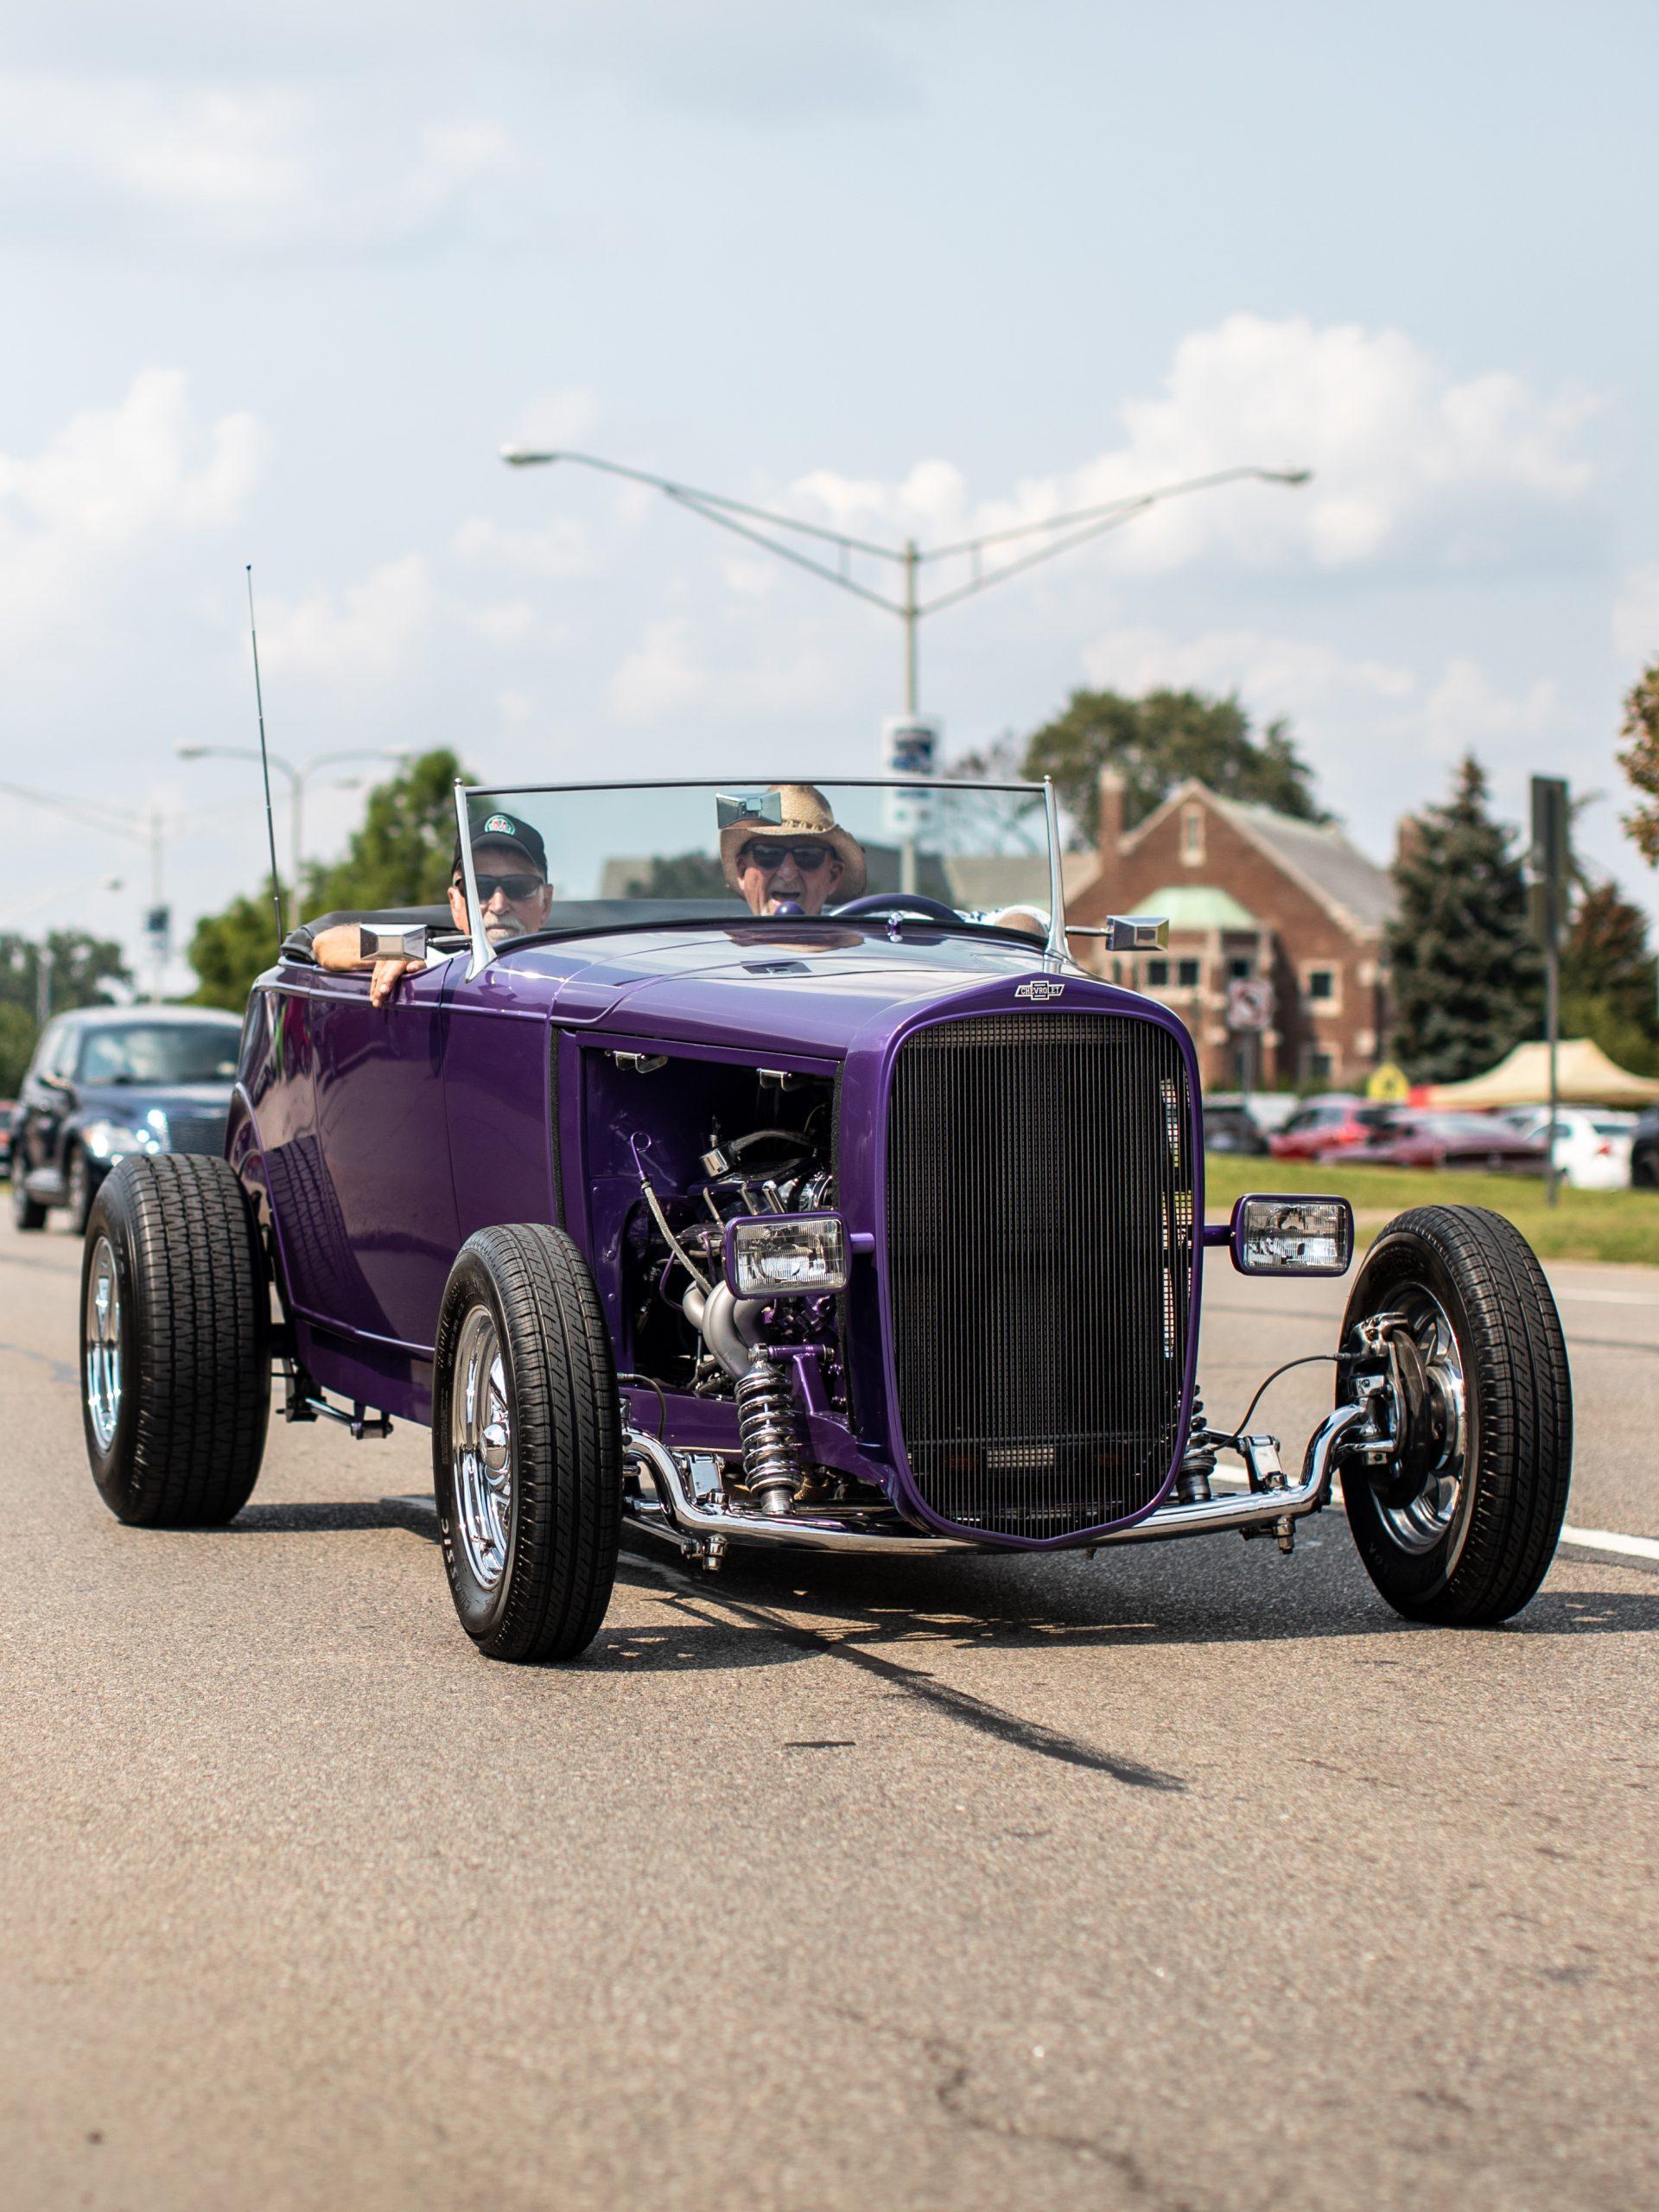 2021 Dream Cruise purple hot rod